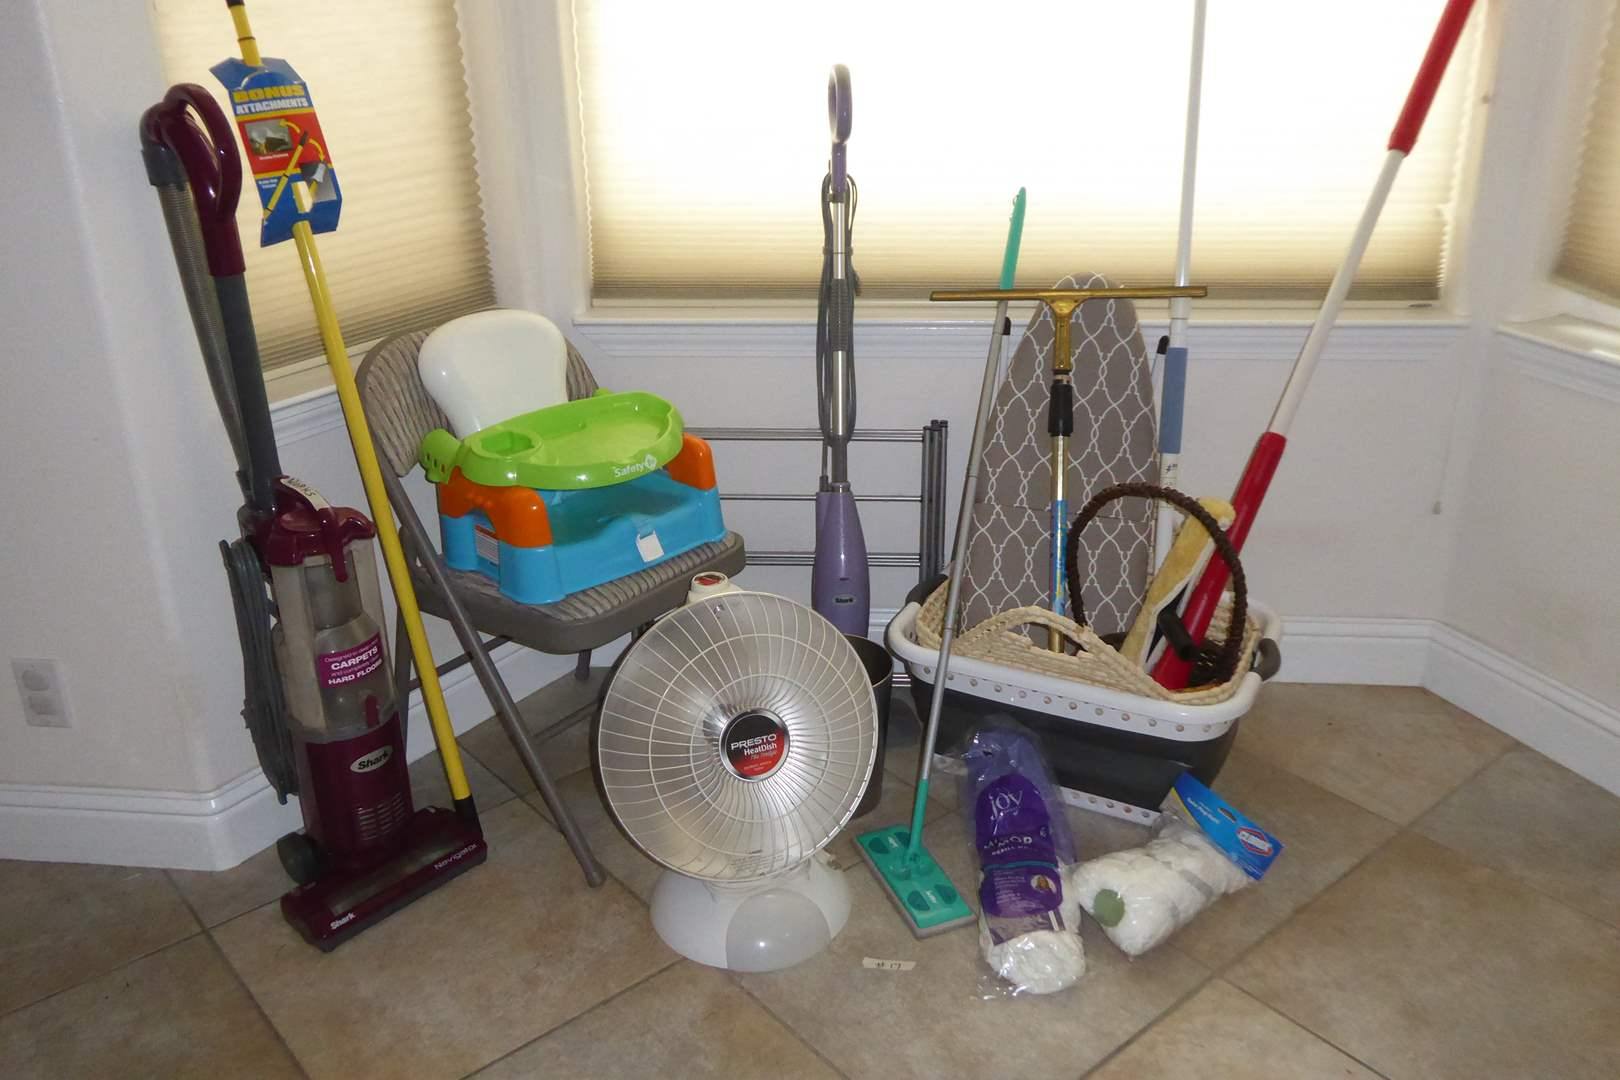 Lot # 17 - Presto Heat Dish Plus Footlight, Shark Vacuum, Safety First Snack Seat & More  (main image)